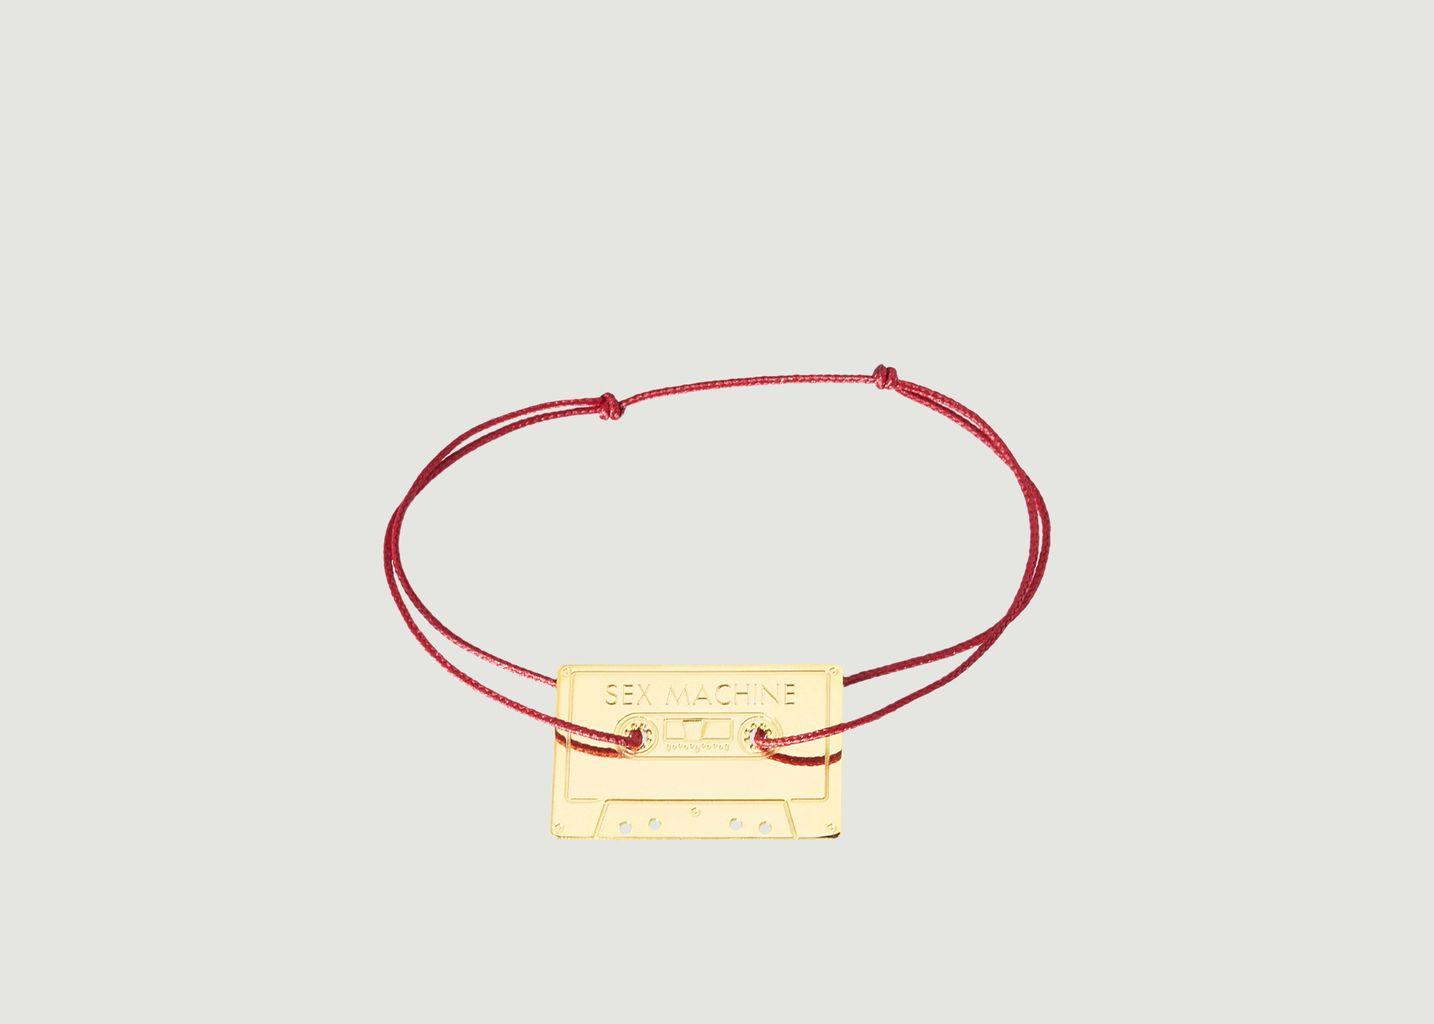 Bracelet Cordon Cassette Sex Machine - La Môme Bijou